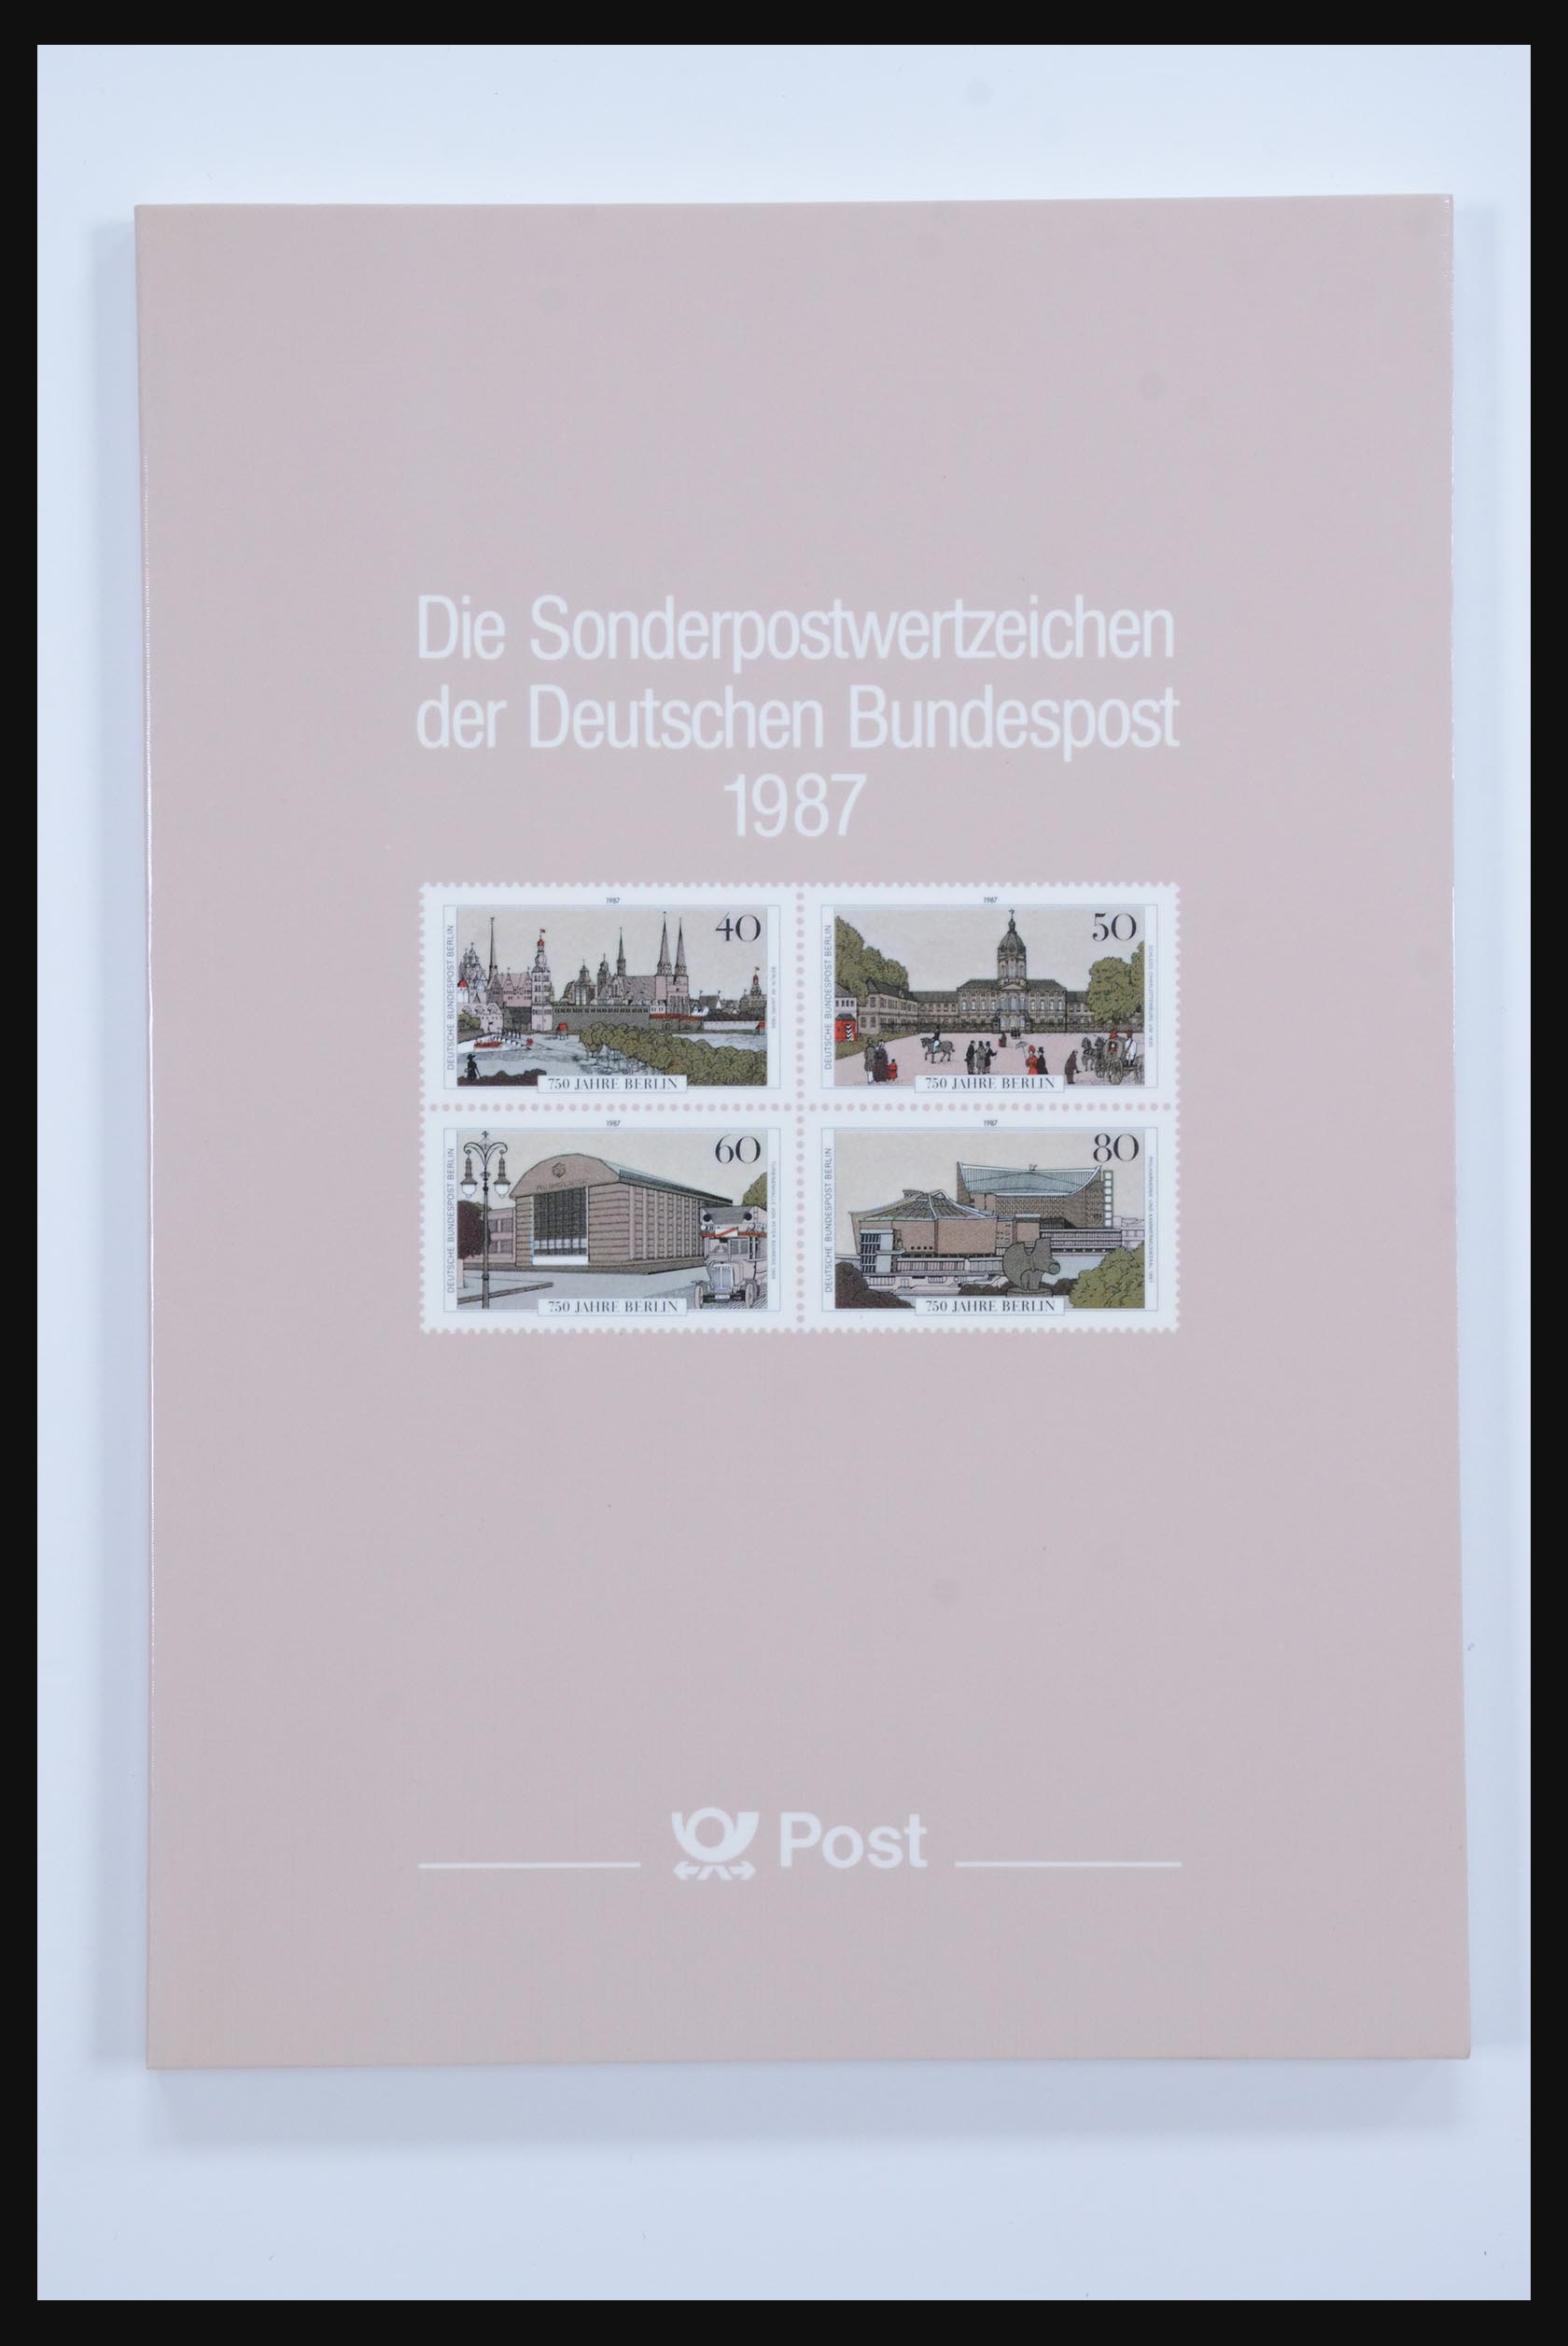 31834 015 - 31834 Bundespost yearbooks 1973(!)-1999.